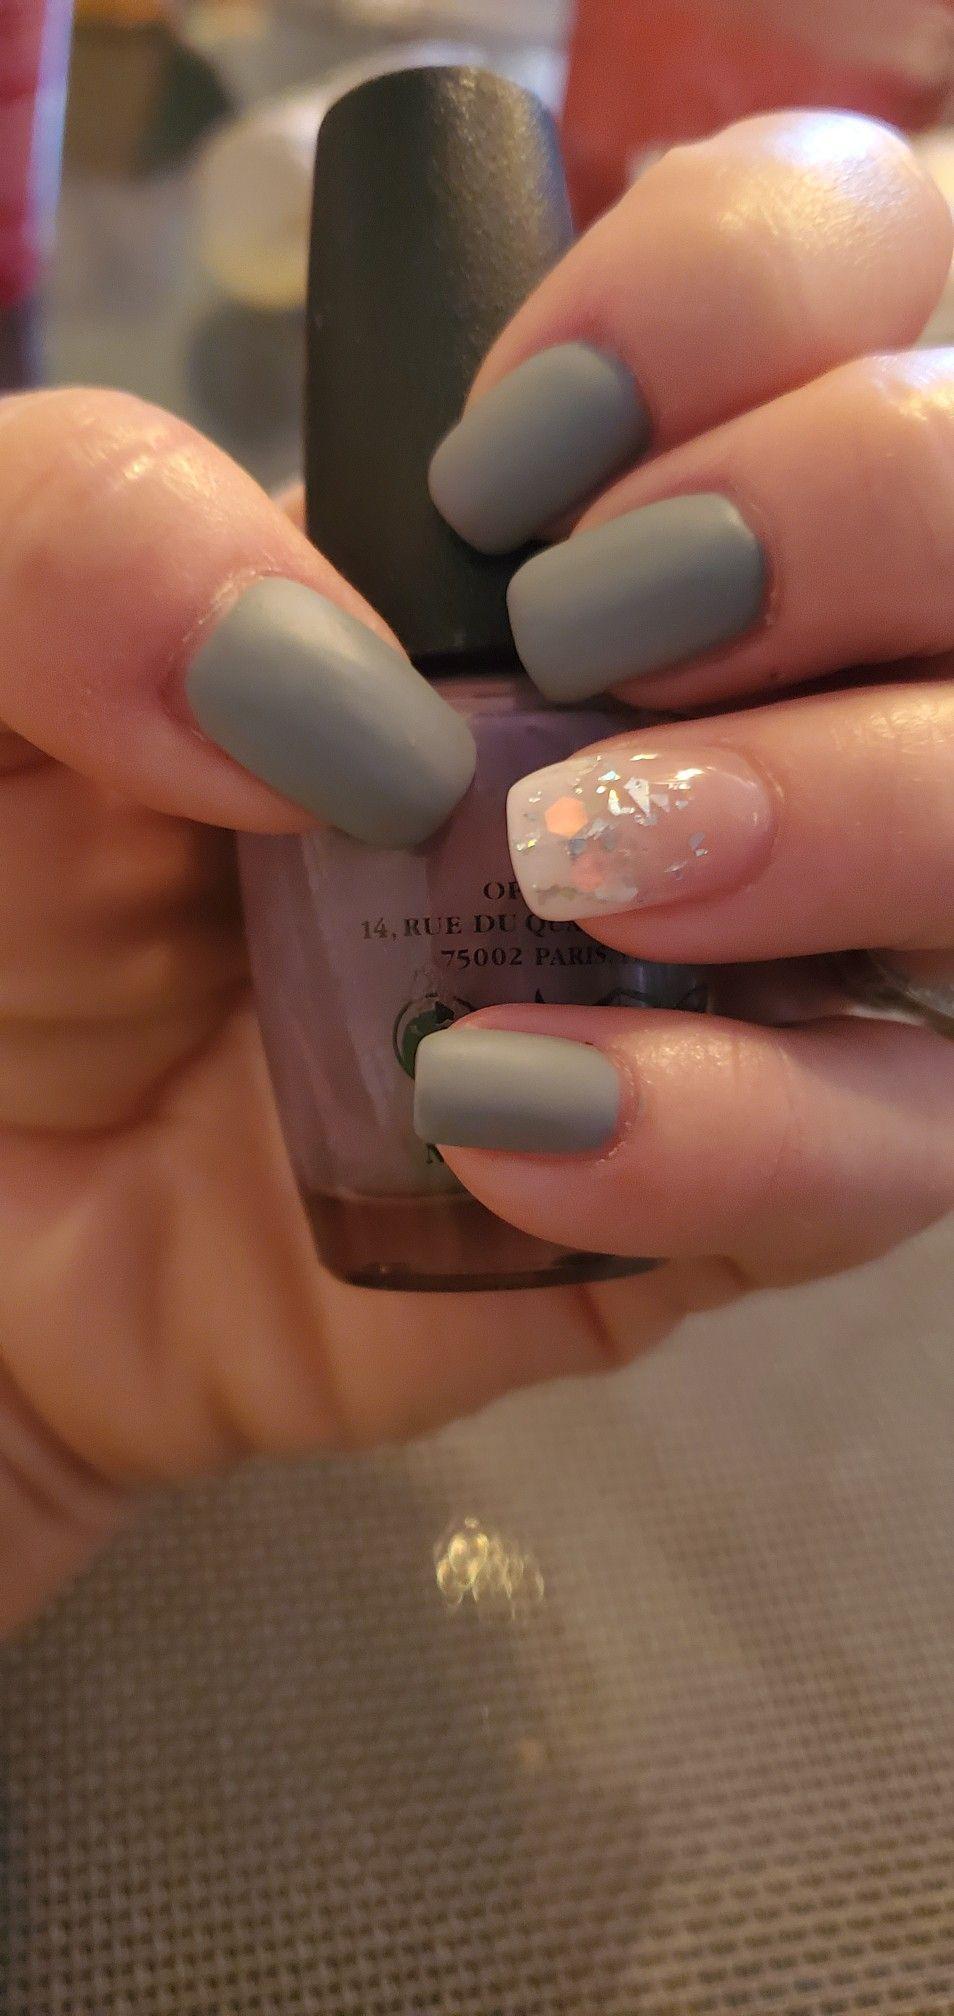 Pin by karoly7s1e8 on Nails in 2020 | Nail colors, Nails